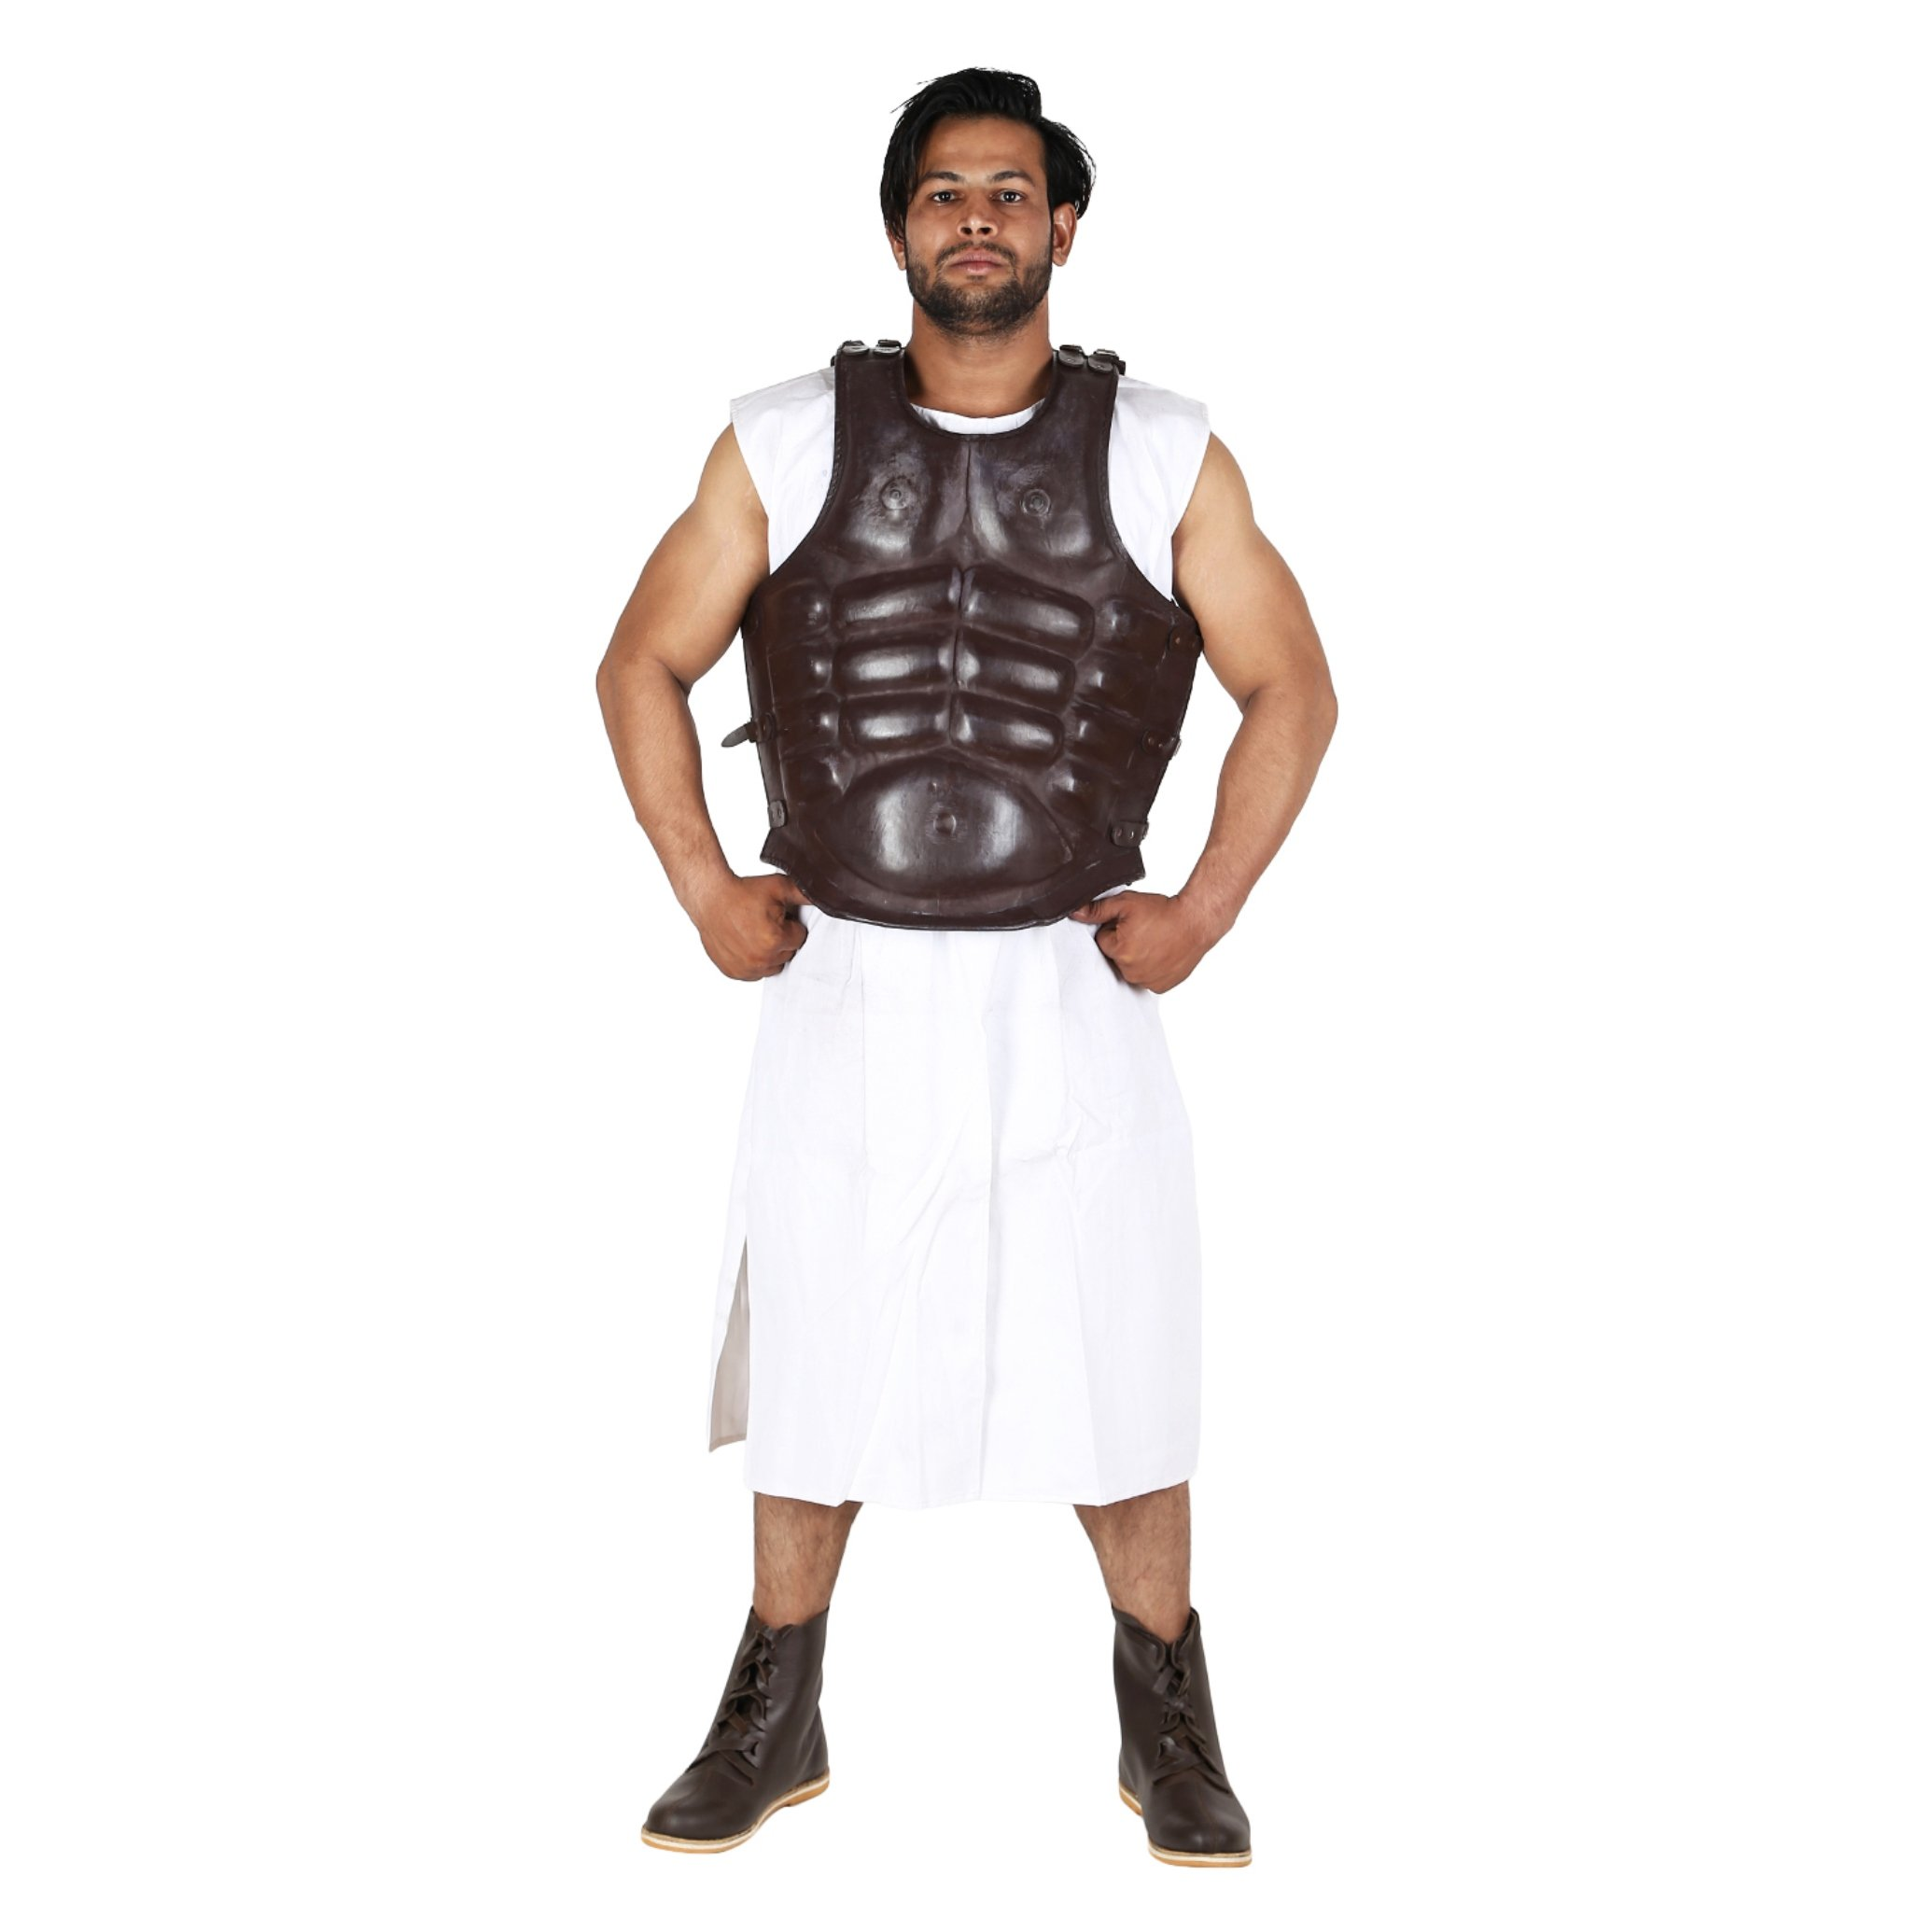 Roman Greek Leather Muscle Body Armor Cuirass reenactment Jacket Dark Brown by Medieval Edge